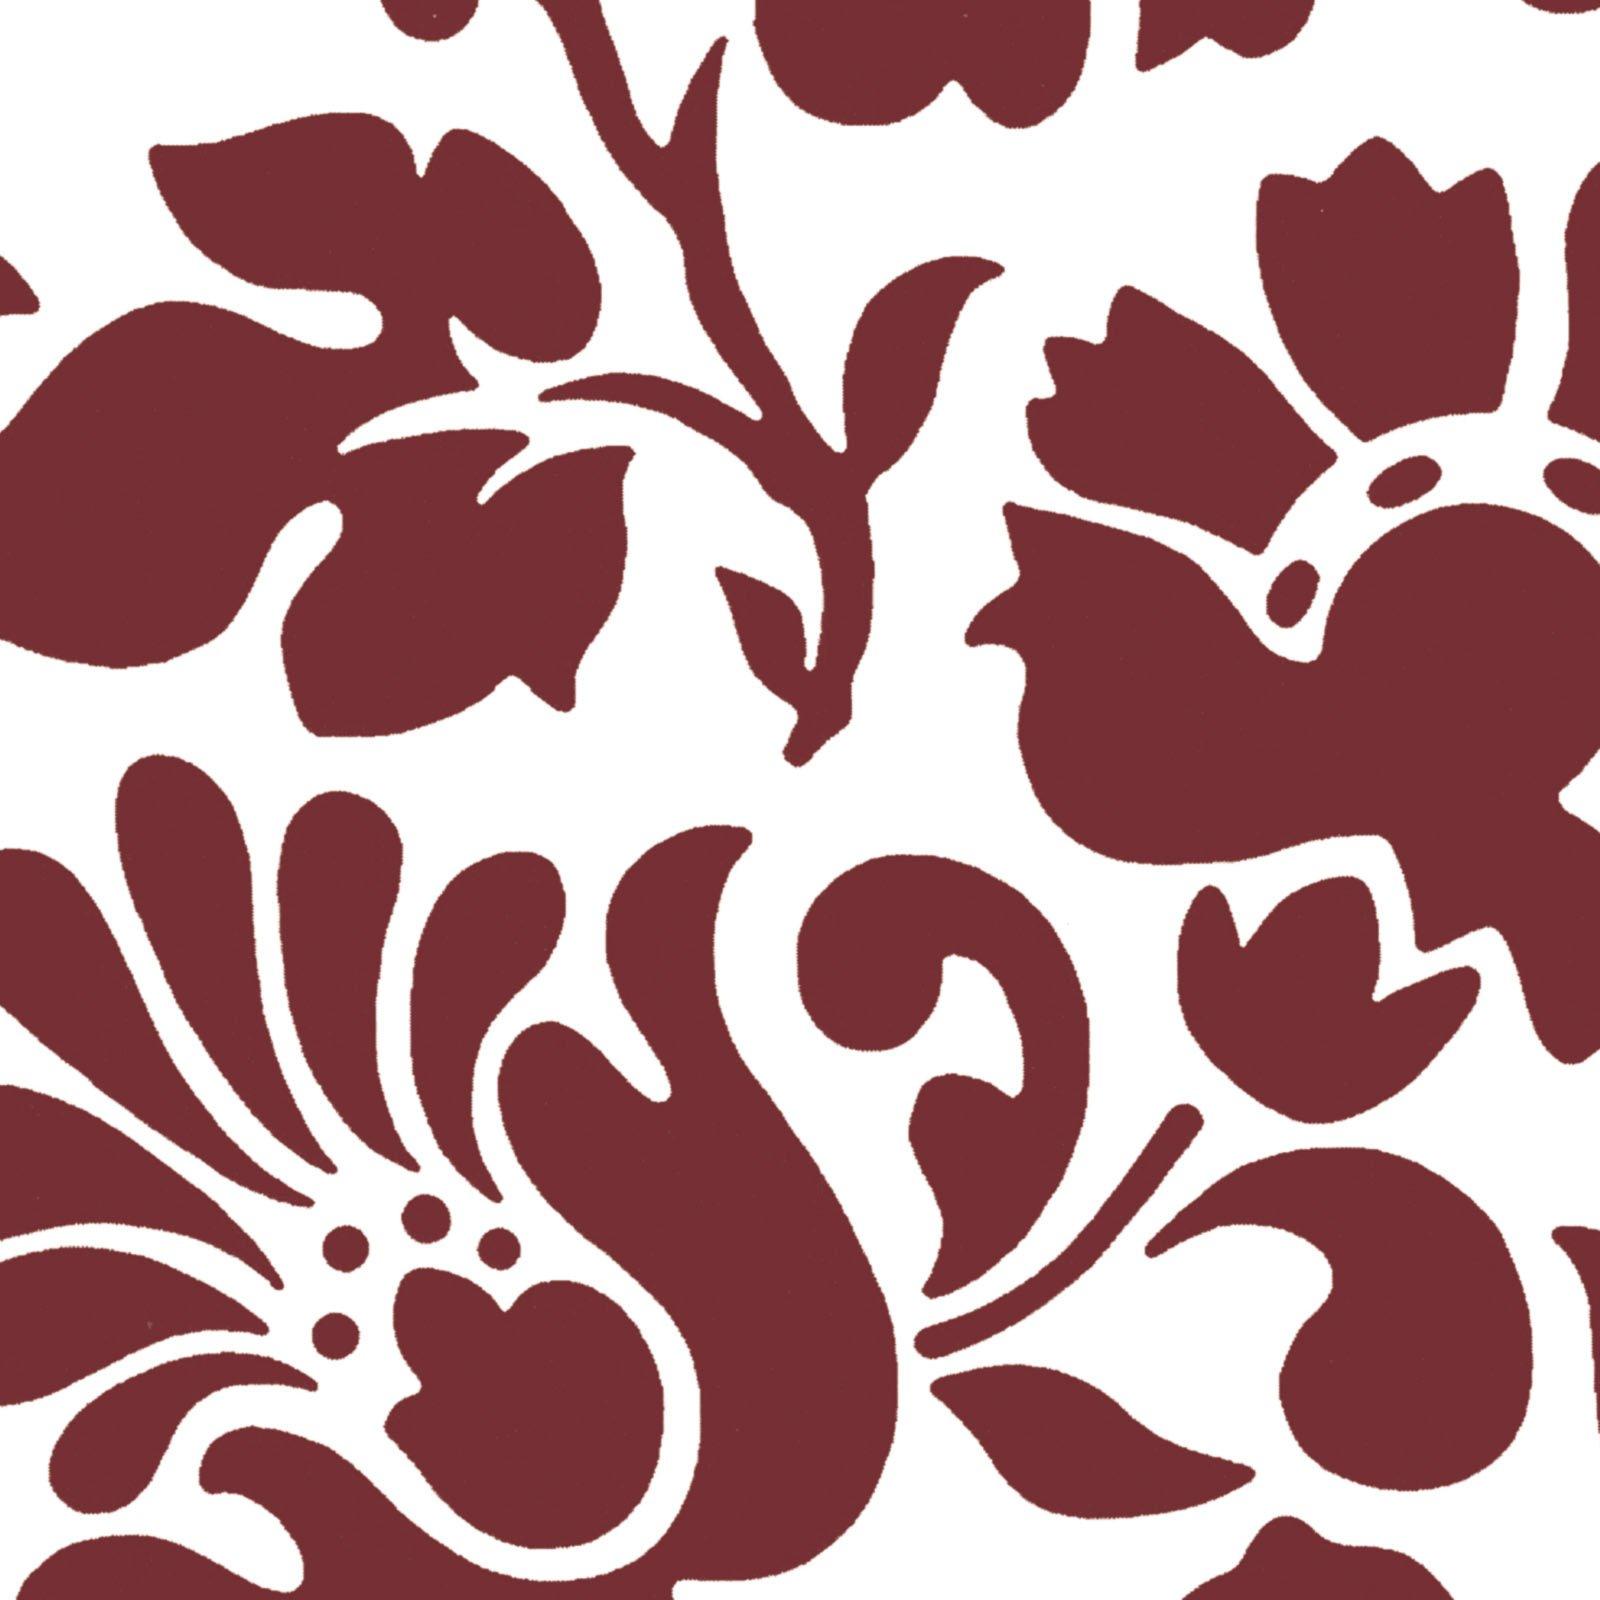 d c fix klebefolie barock bordeaux 45x200 cm dekor m belfolie klebefolie renovieren. Black Bedroom Furniture Sets. Home Design Ideas